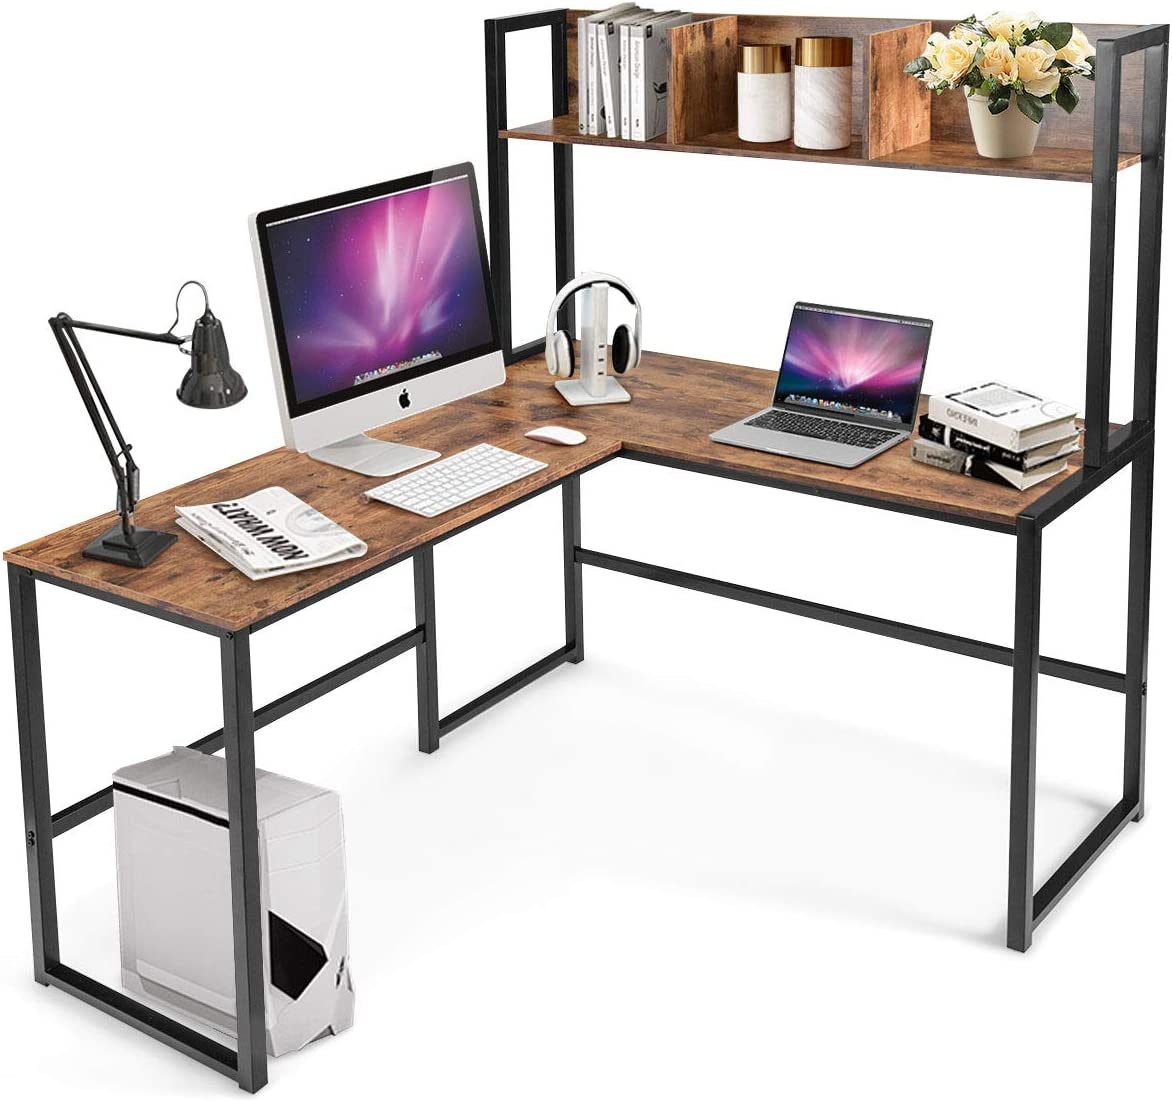 OFM Essentials Collection 2-Drawer Office Desk, in Harvest